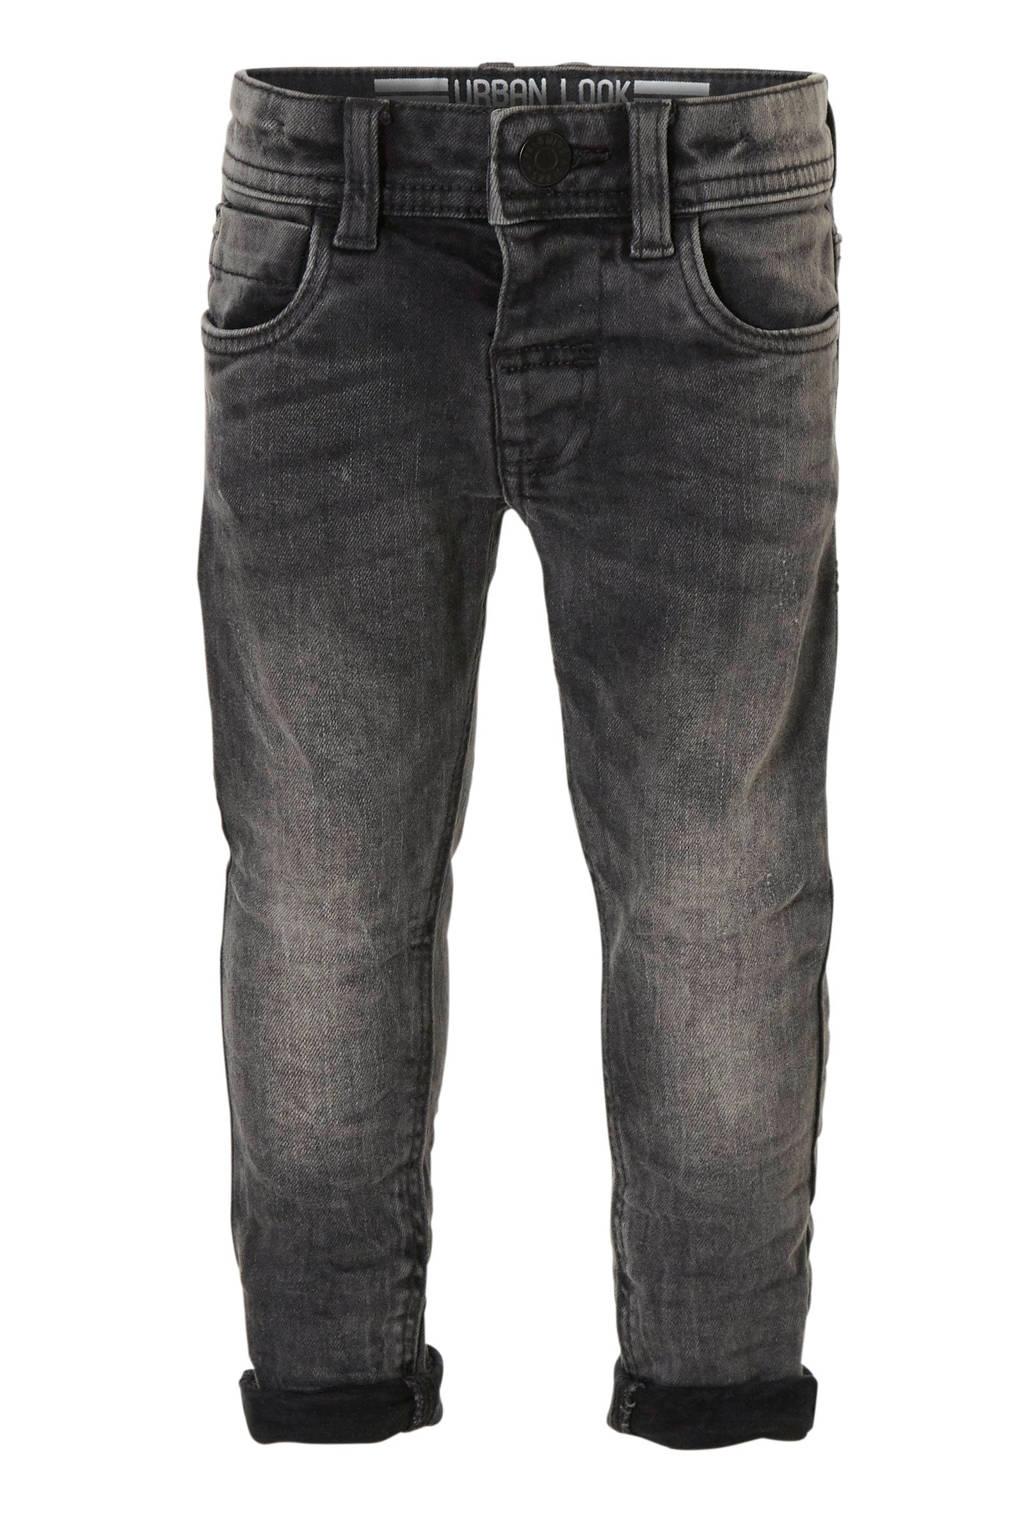 C&A Palomino super skinny jeans grijs, Grijs